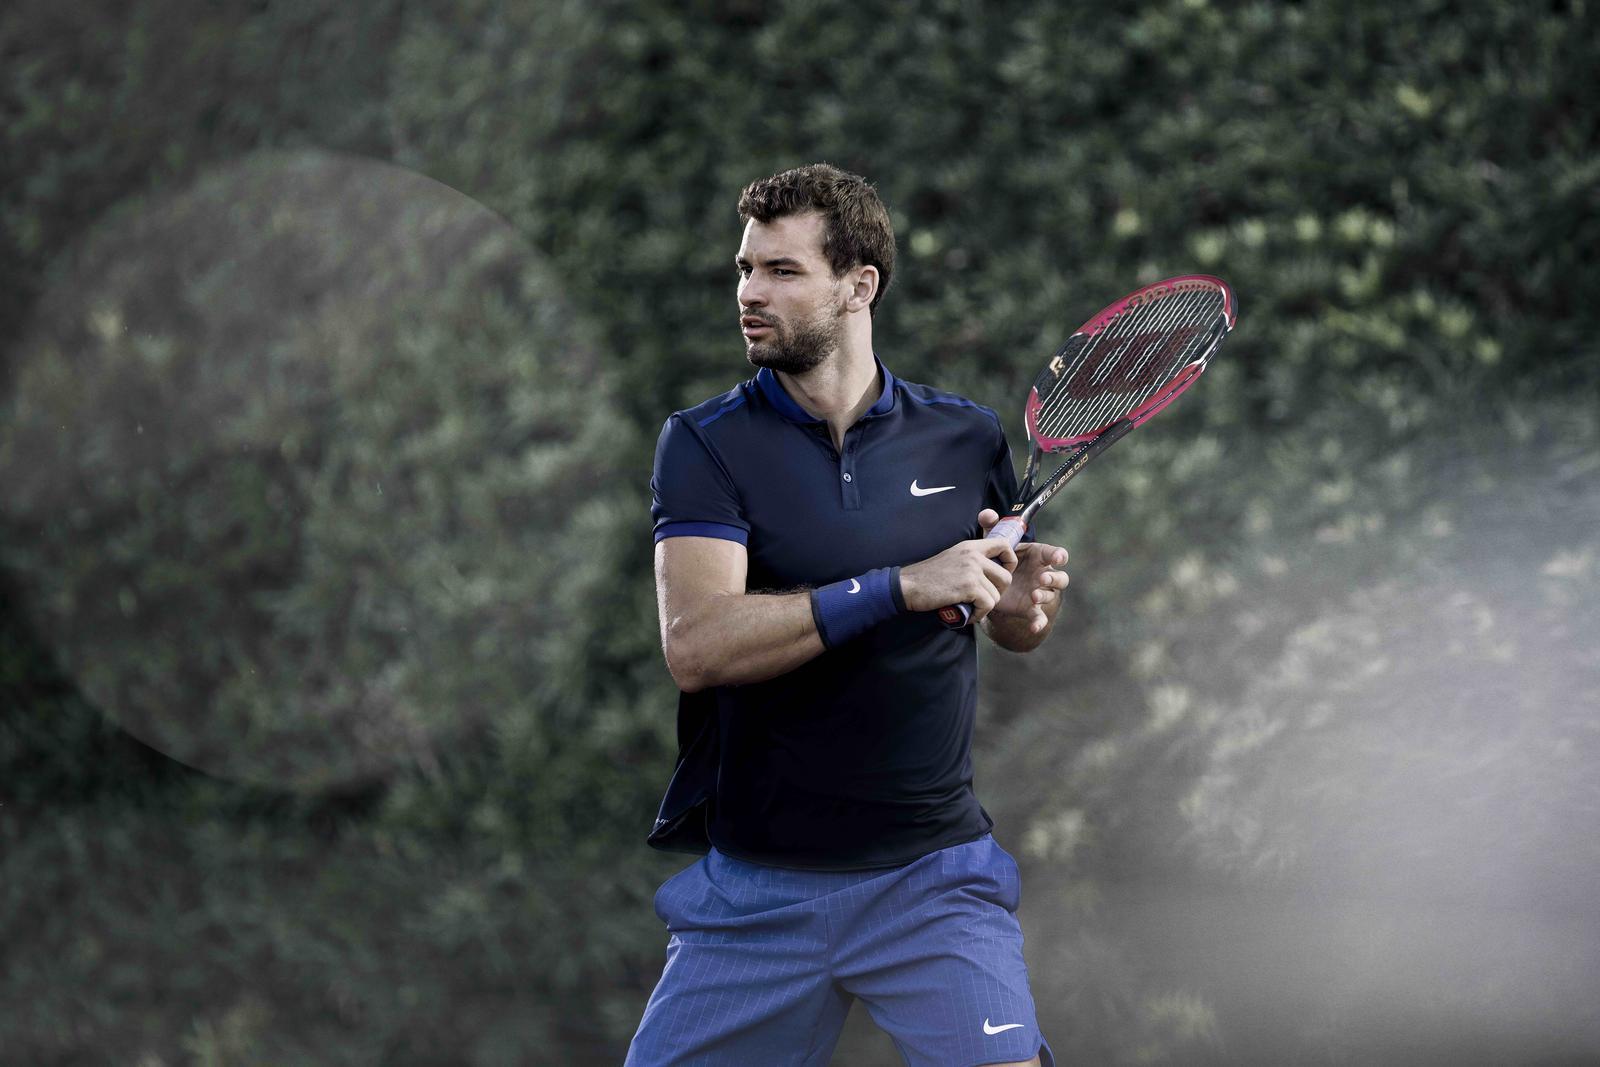 Grigor dimitrov polo nike roland-garros 2016 tennis